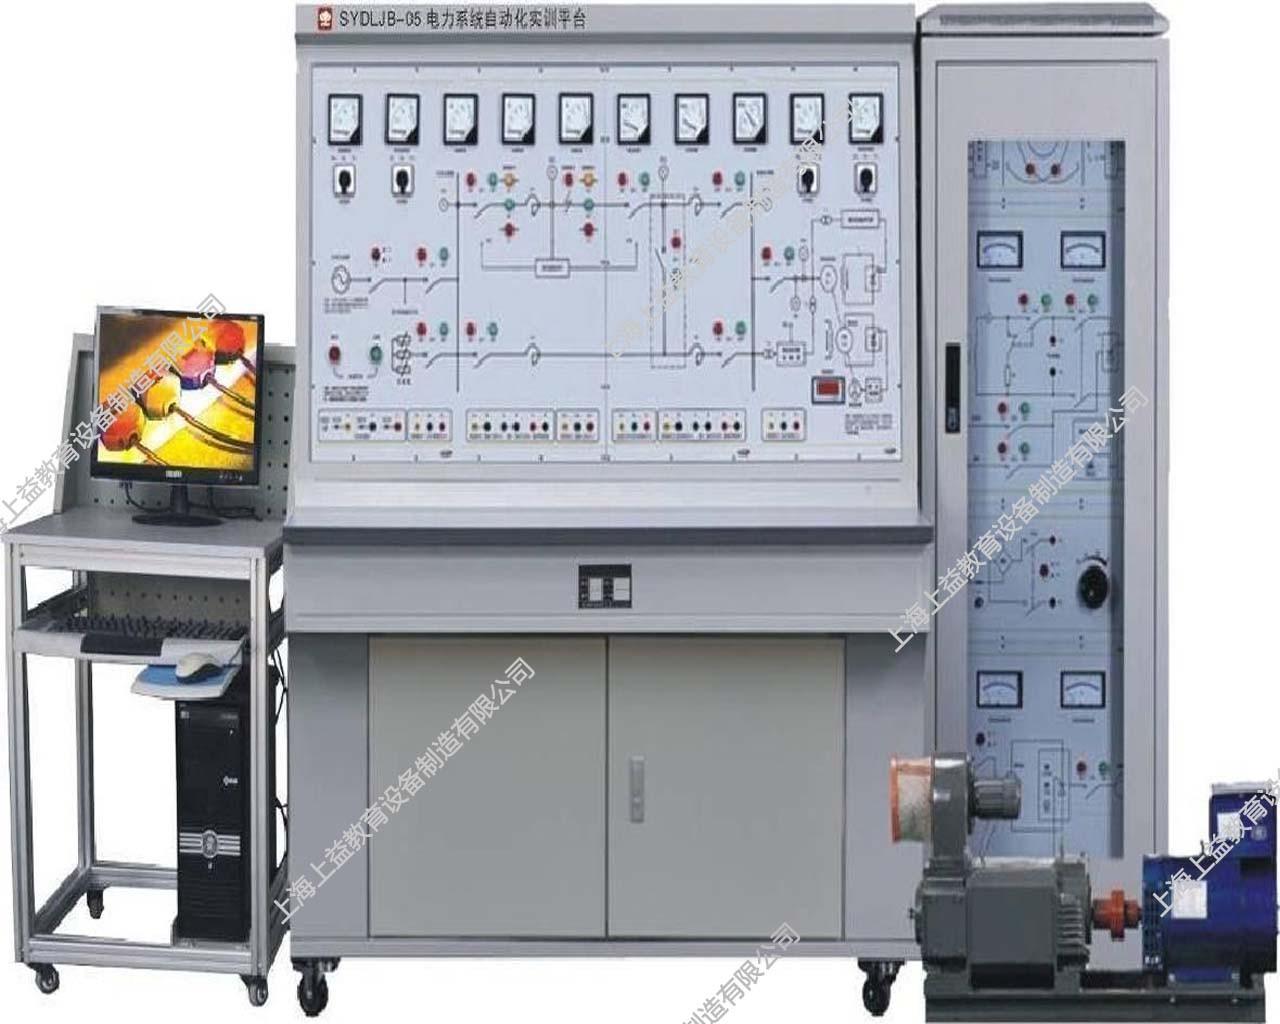 SYDLJB-05电力系统自动化wwwlehu8vip平台